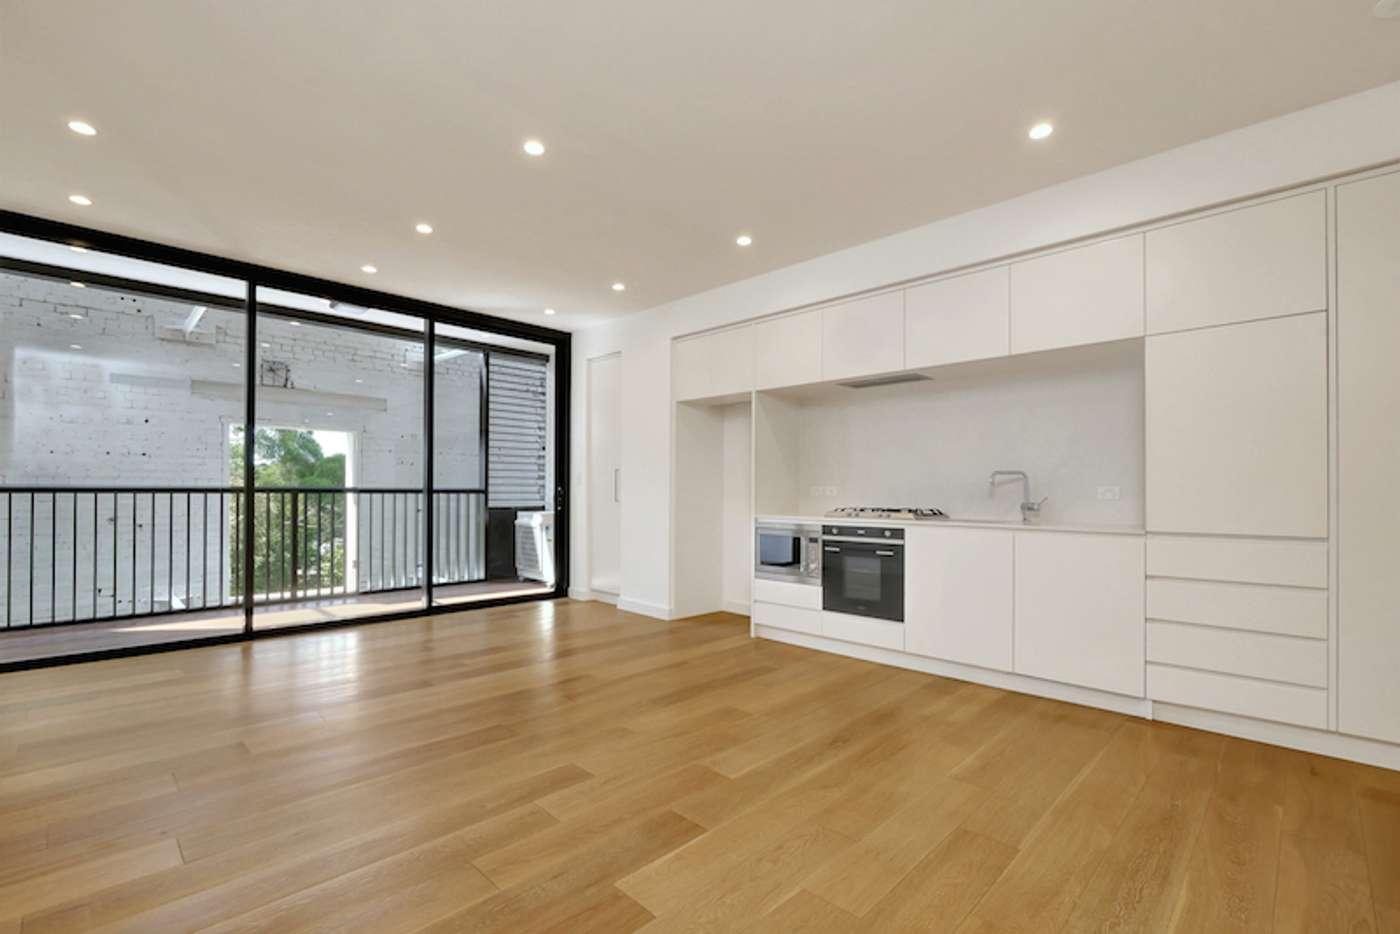 Main view of Homely studio listing, 306/280 Jones Street, Pyrmont NSW 2009